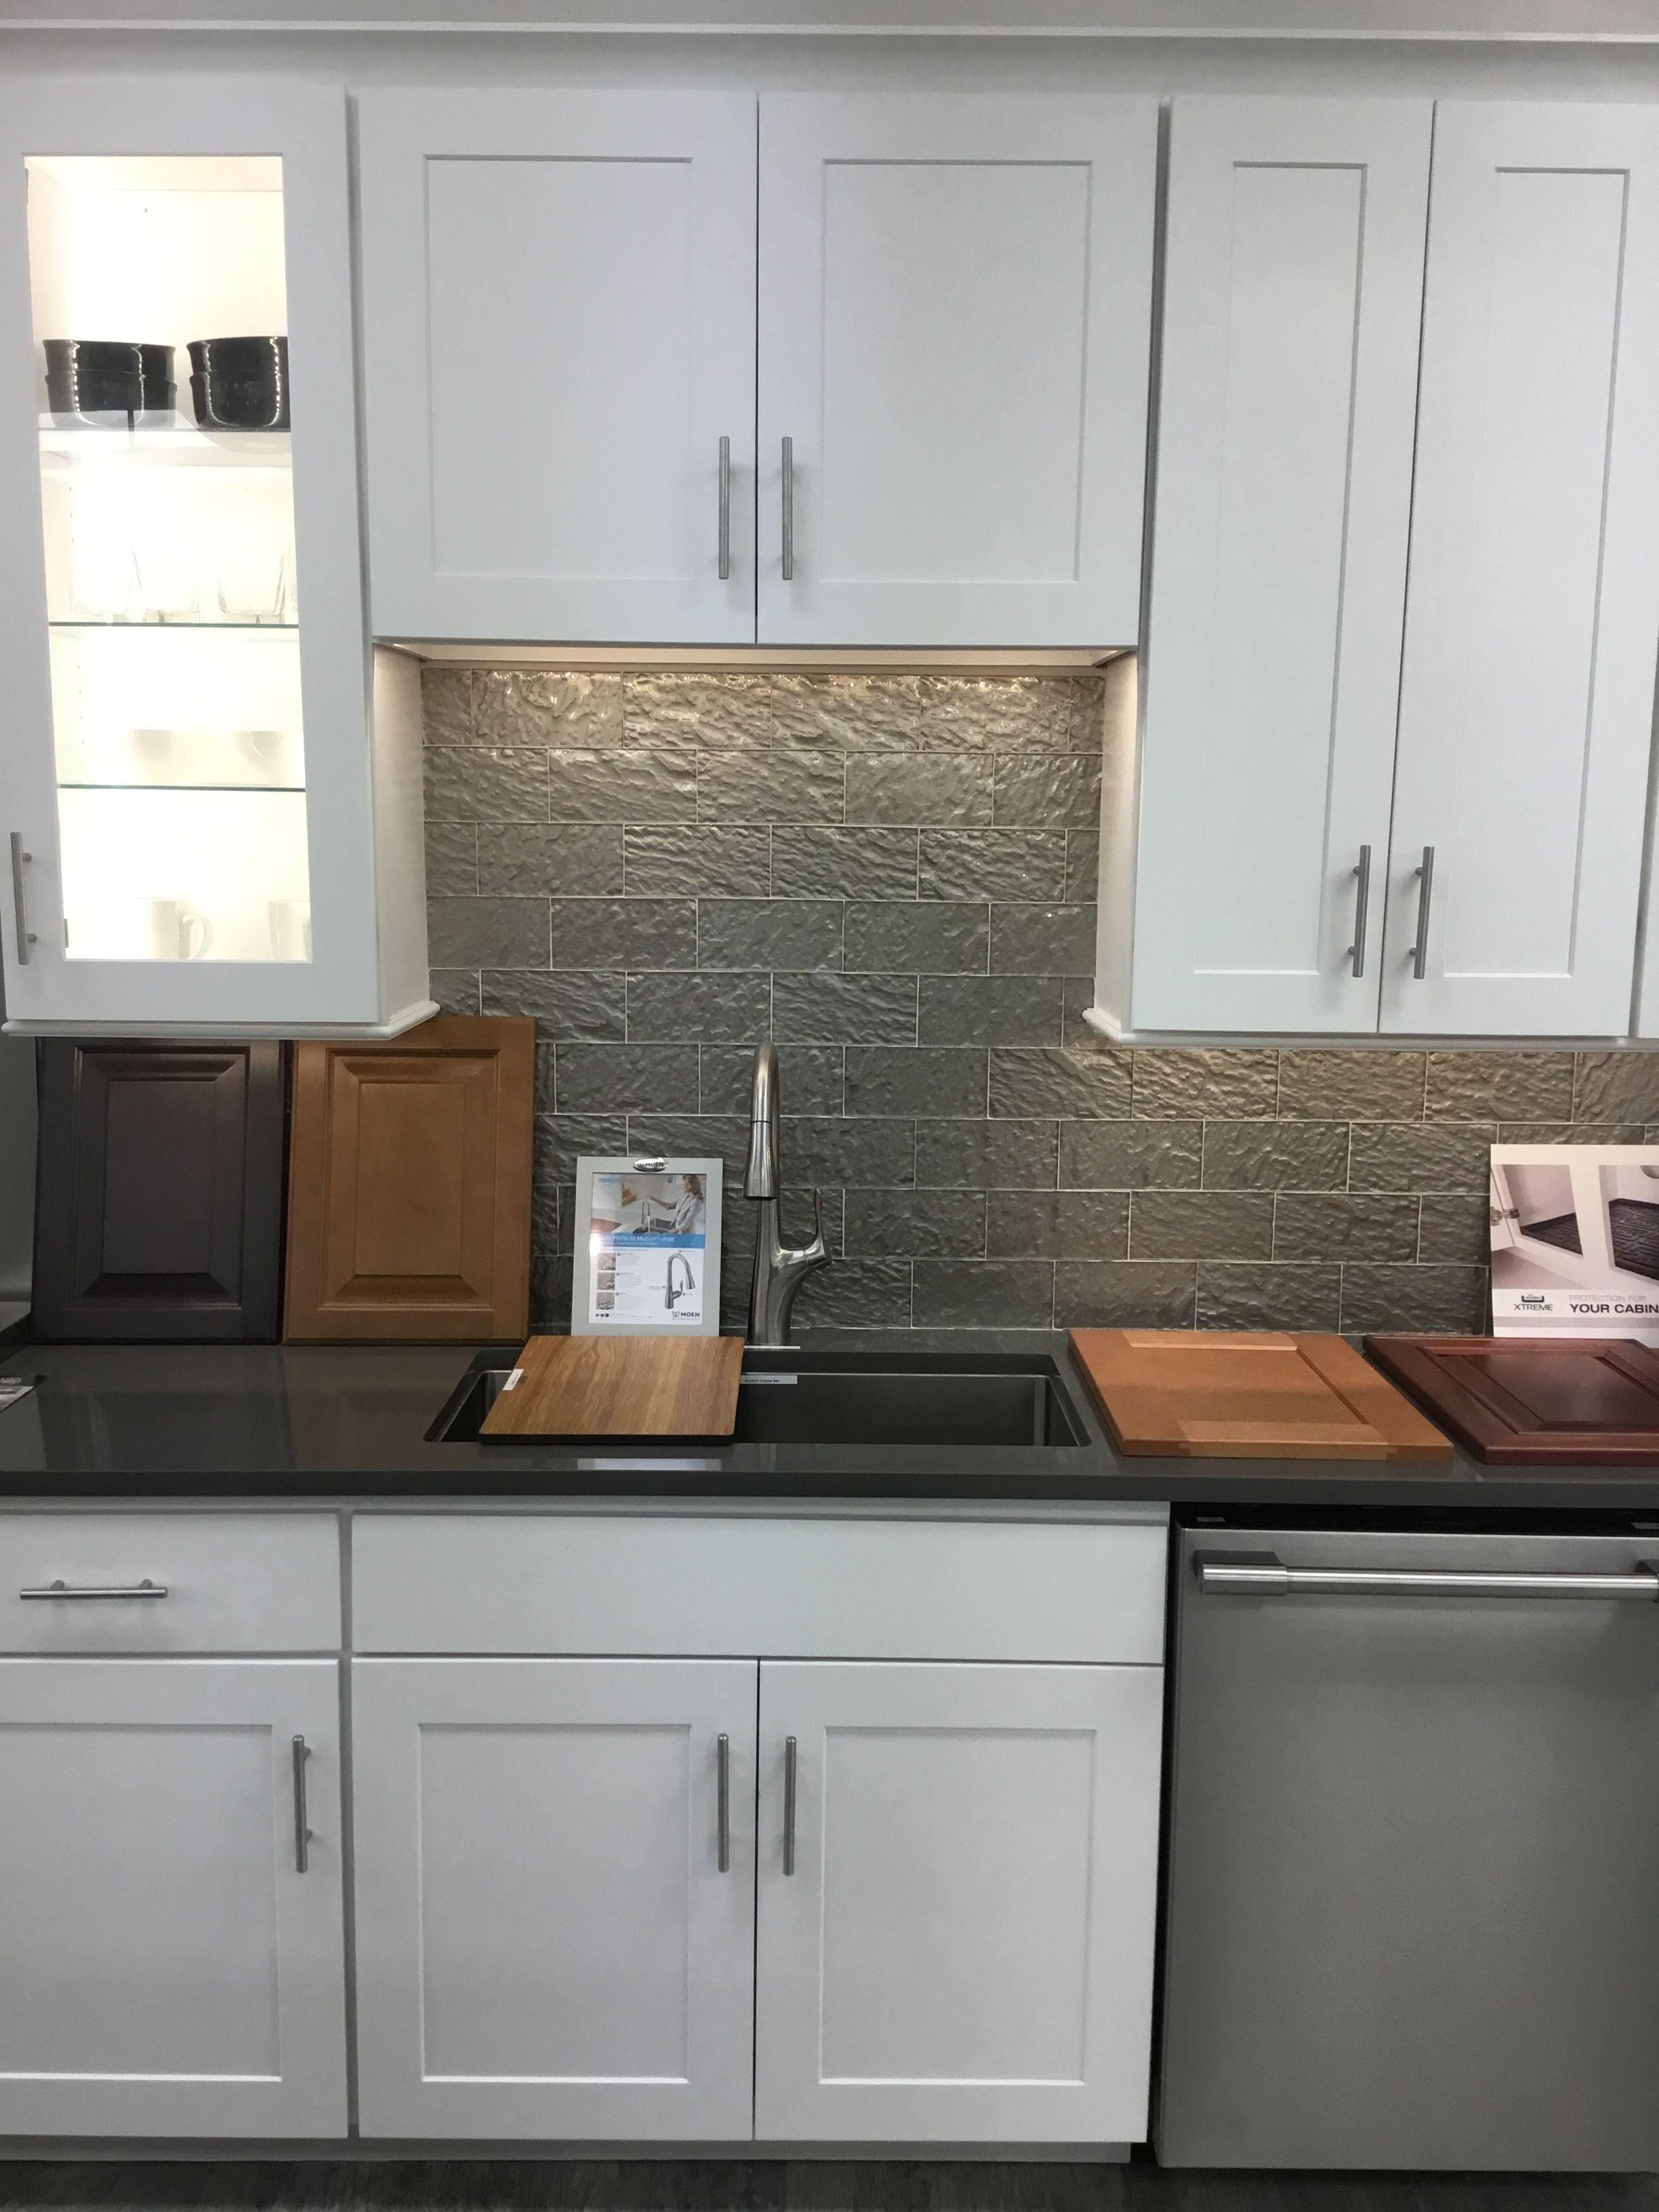 Affordable kitchen cabinets Orlando . Visit Arteek Supply And Design ...